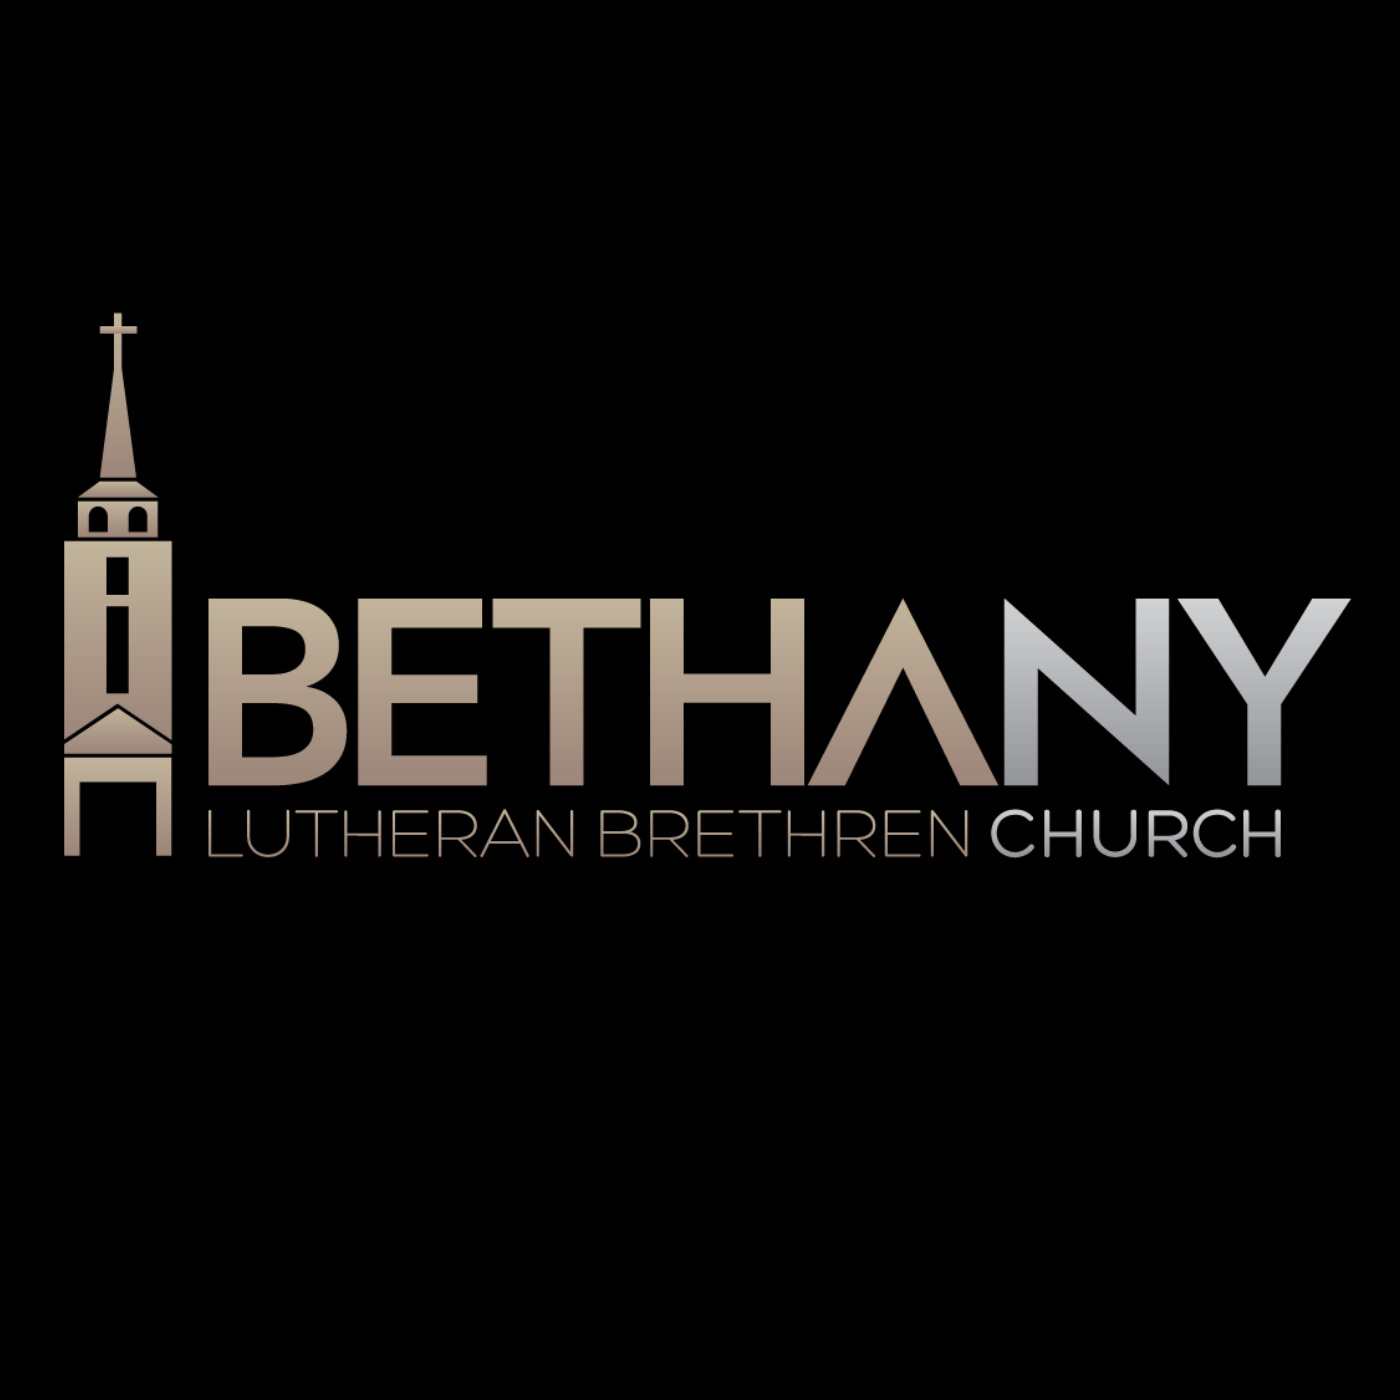 Bethany LBC- Staten Island